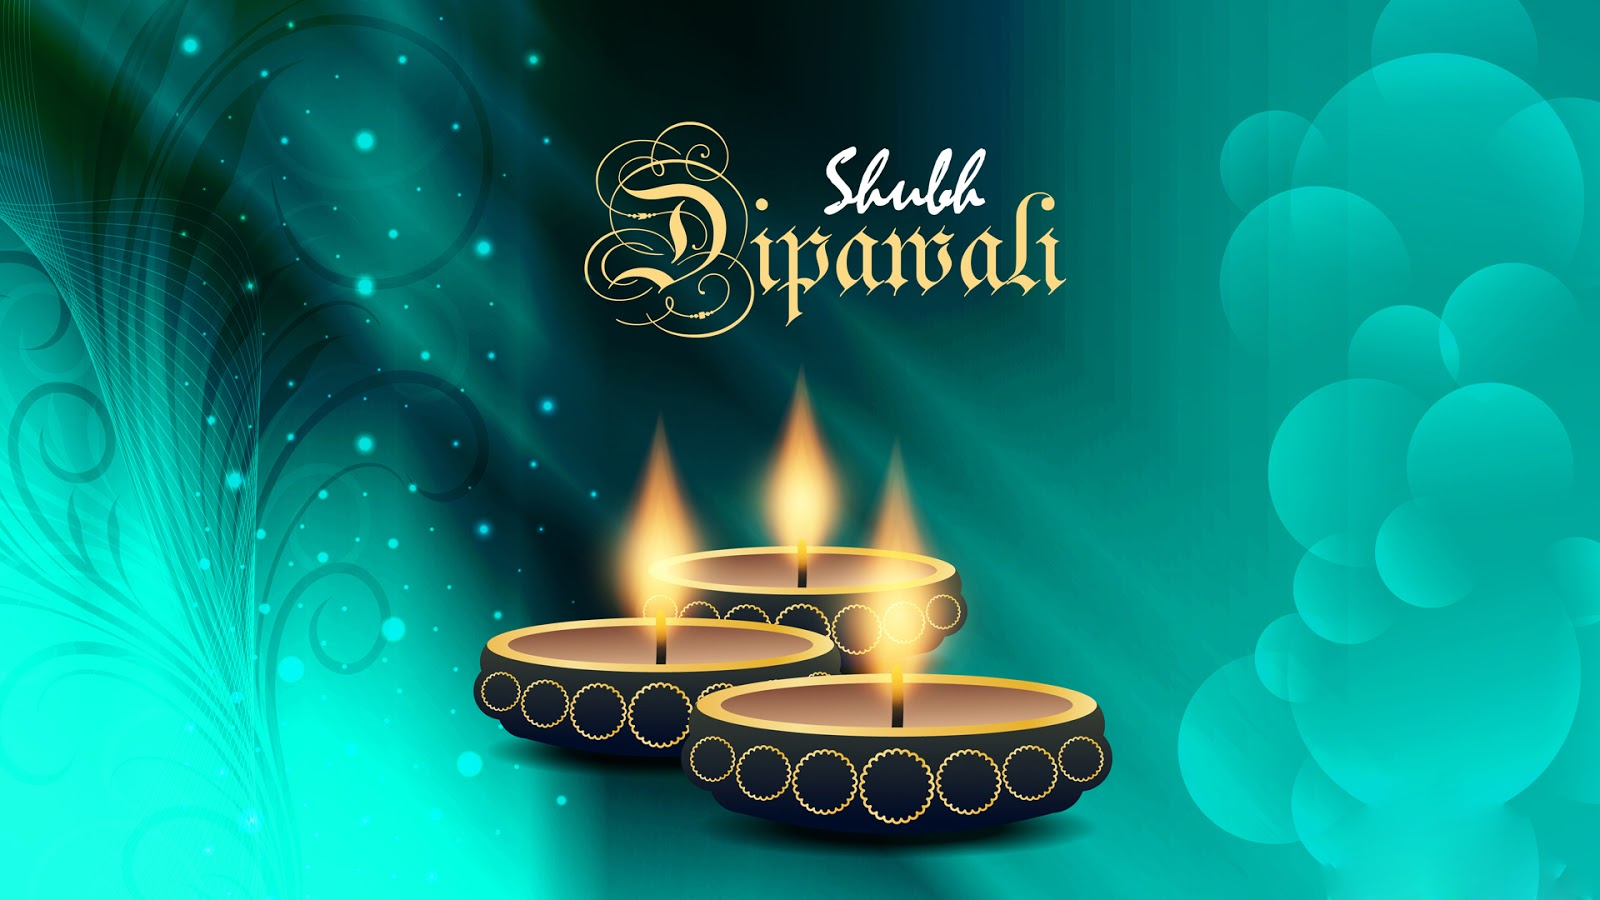 Deepavali 2016 Wishes